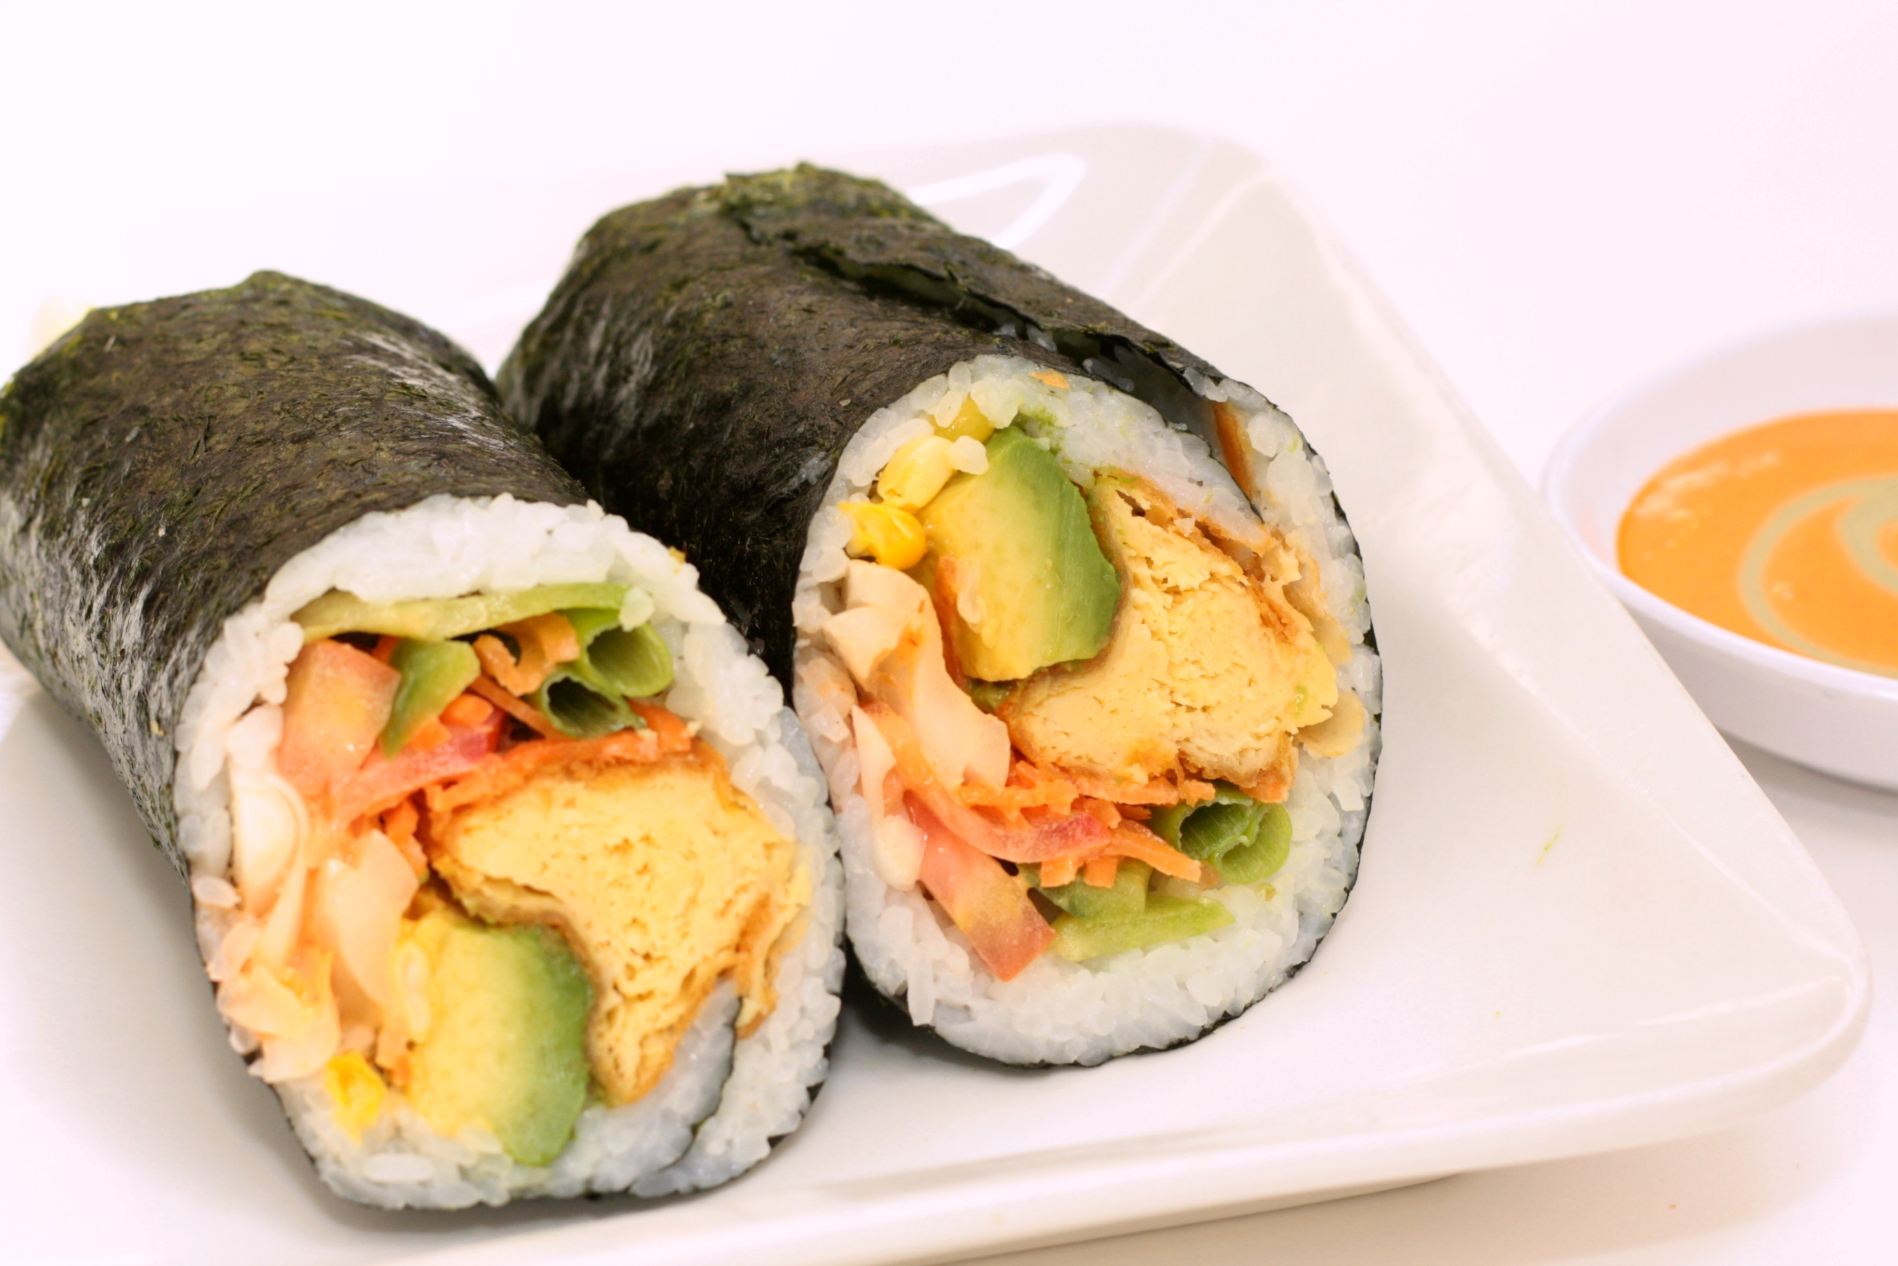 Tofu_Sushi_Burrito_San_Francisco_Japanese_Restaurant_Kui_Shin_Bo.jpg